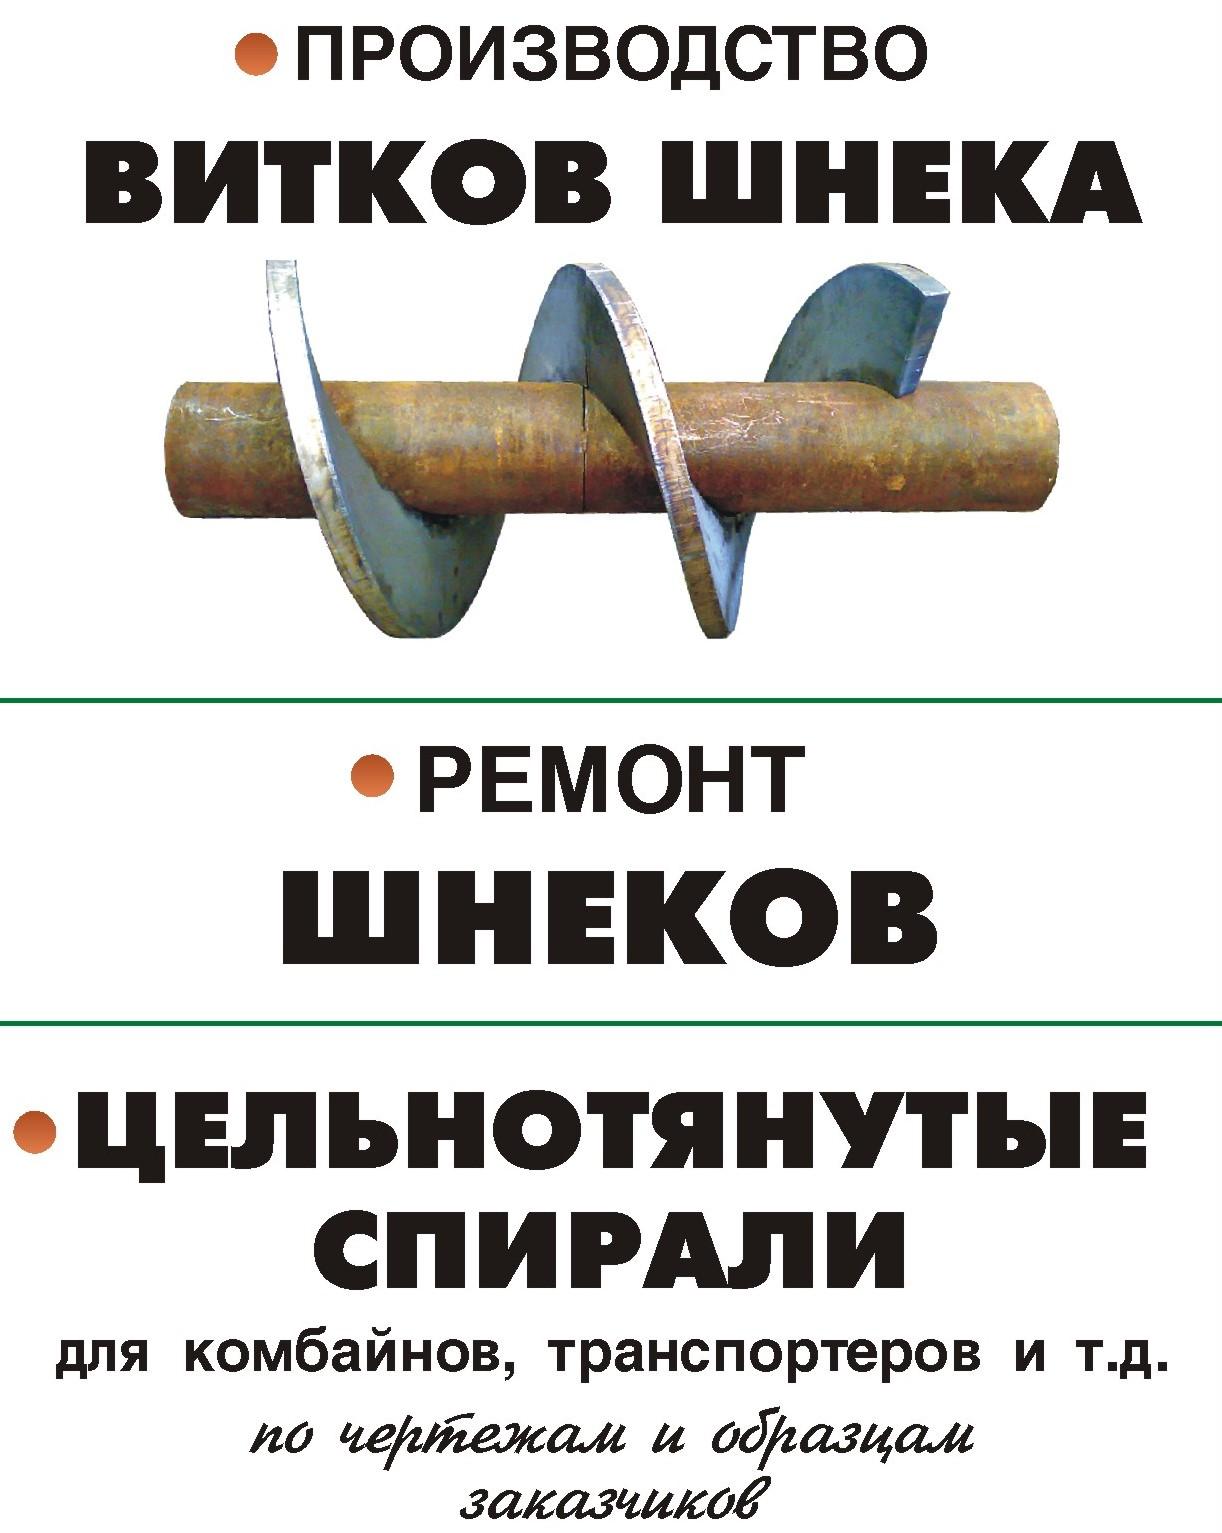 SHnek-obyava